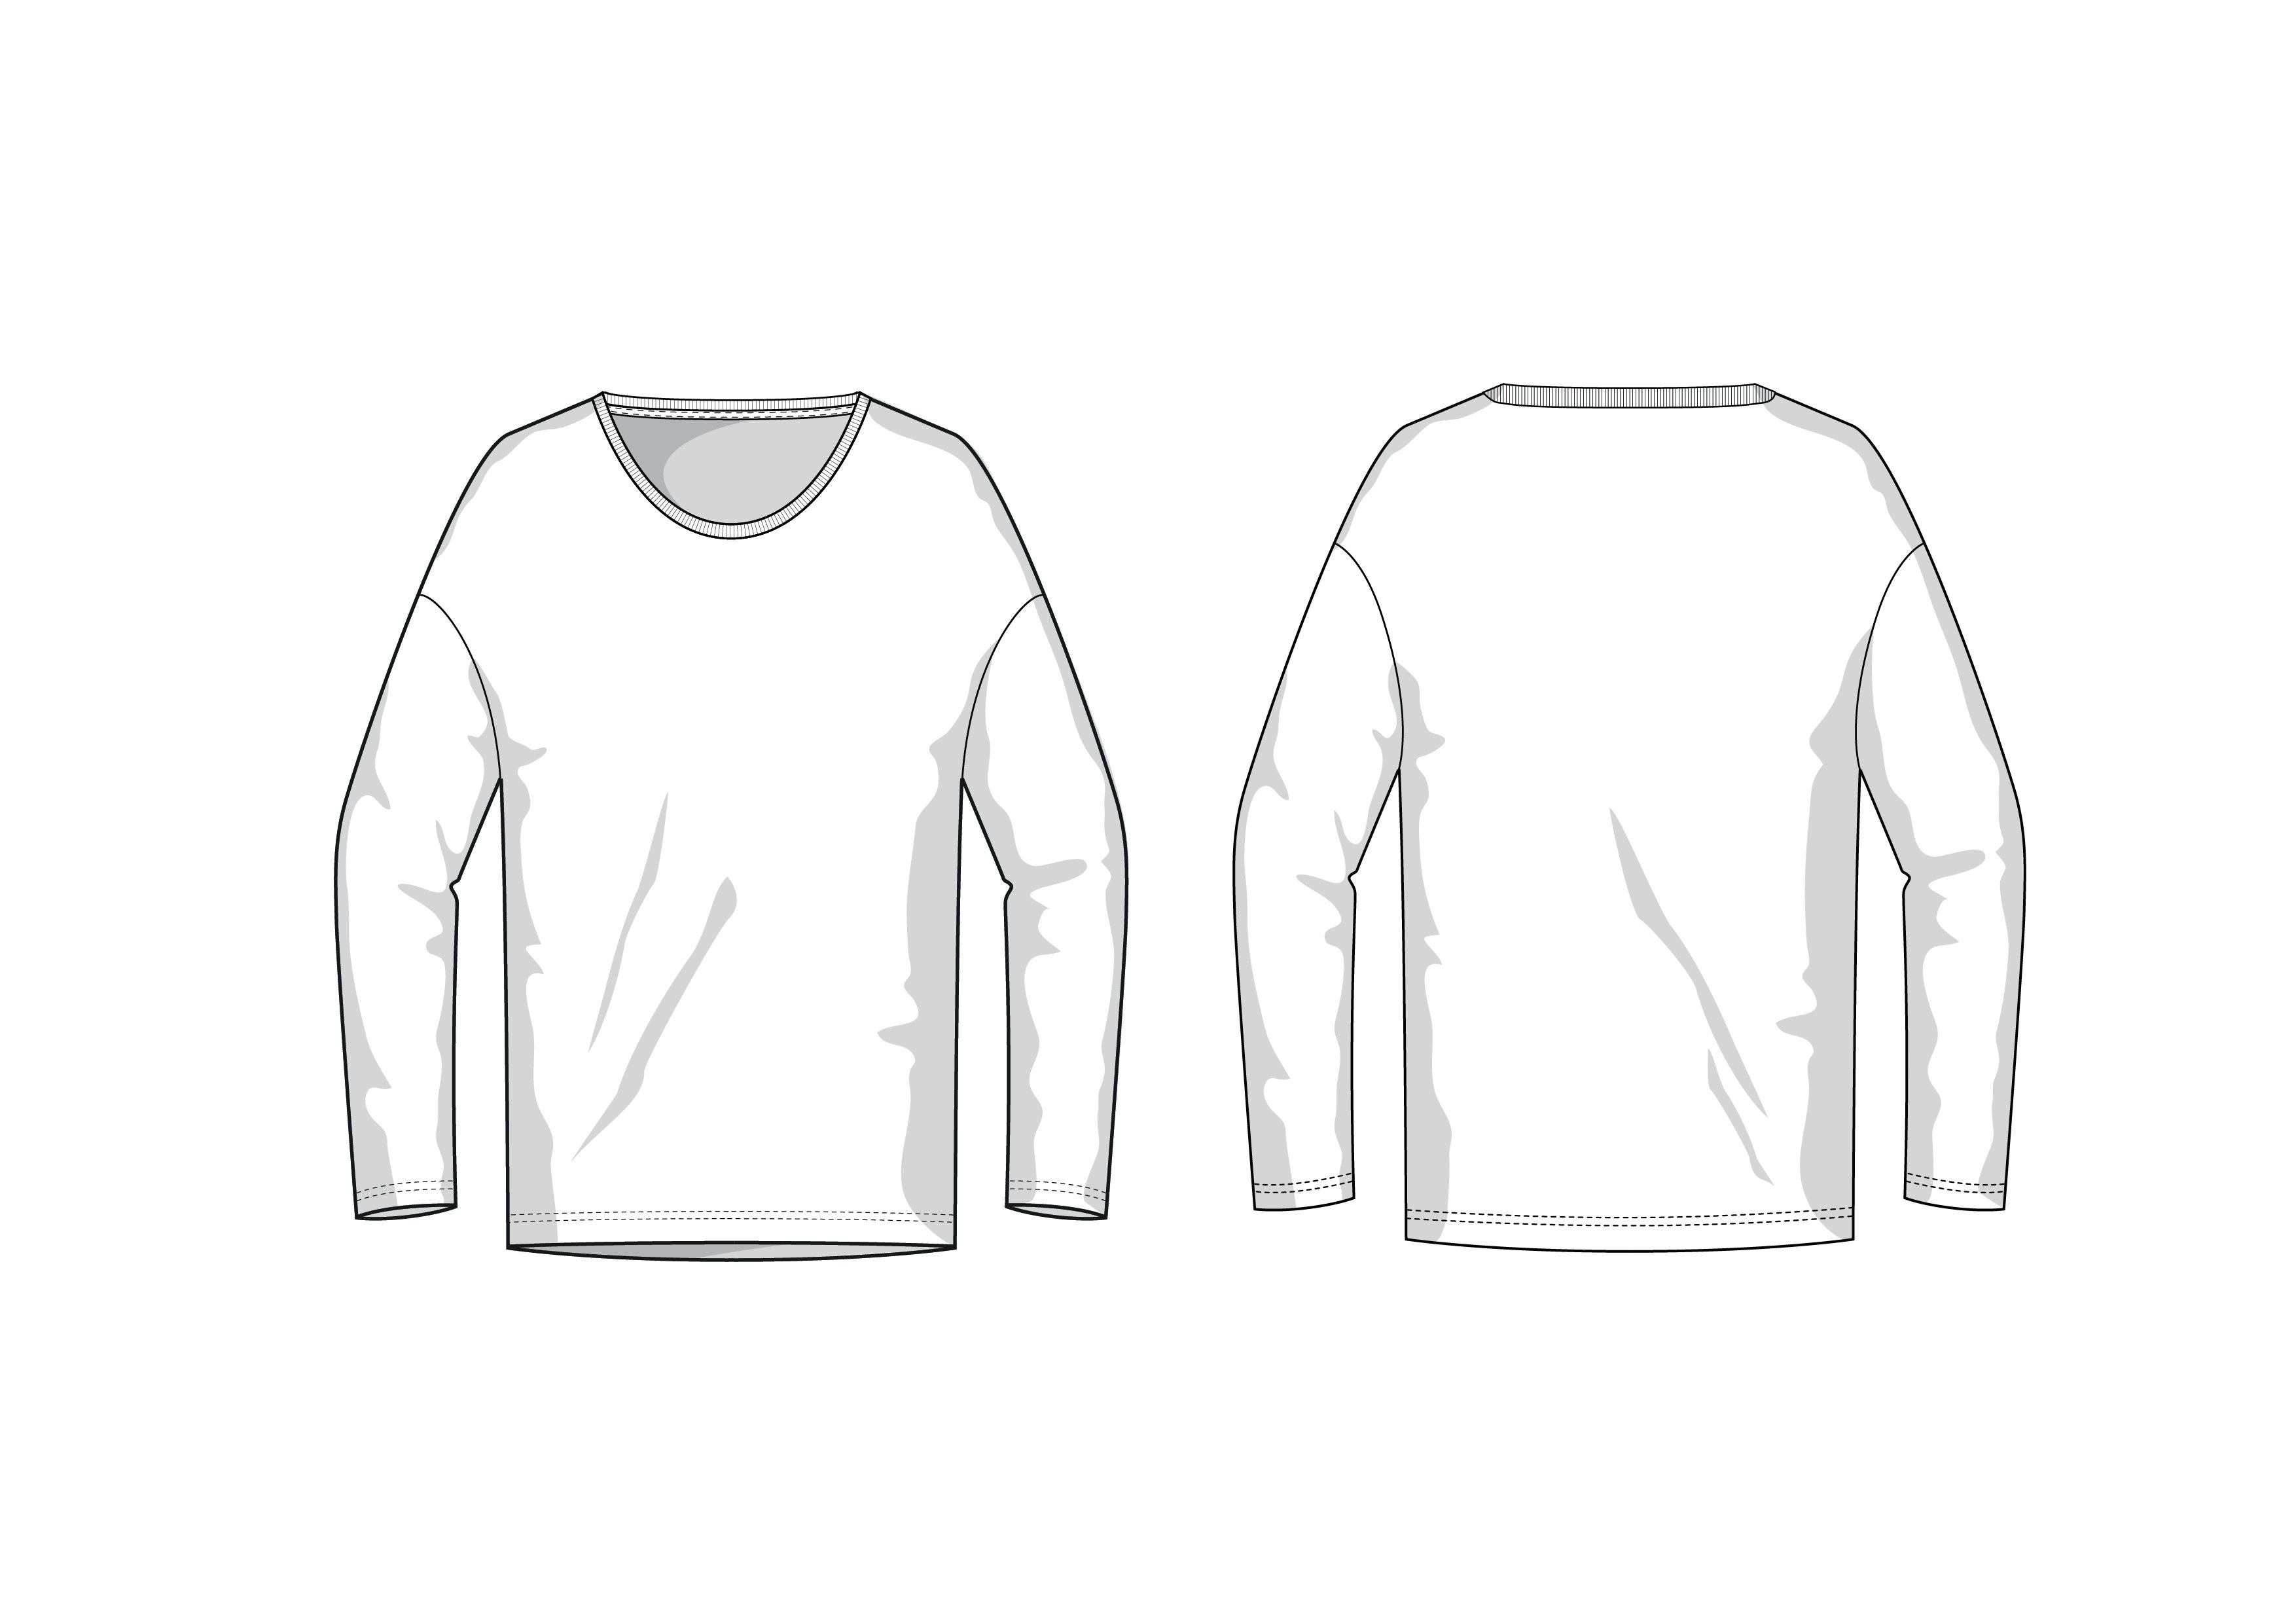 Longsleeve Fashion Flat Template ~ Templates ~ Creative Market